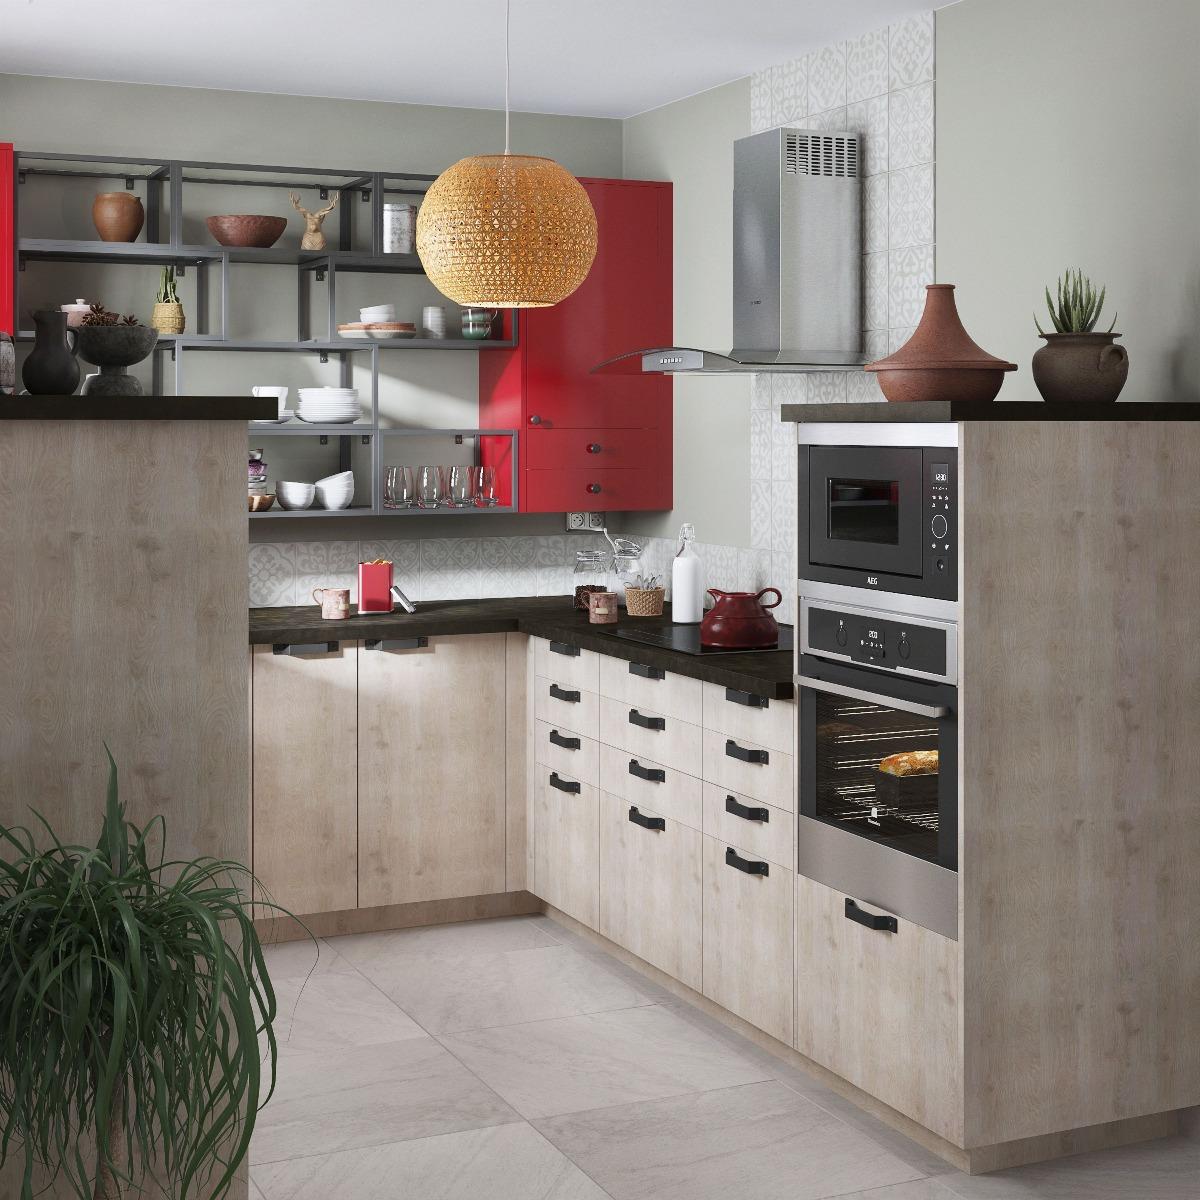 Delinia Nordik Designer Kitchen Mobi - Example 4